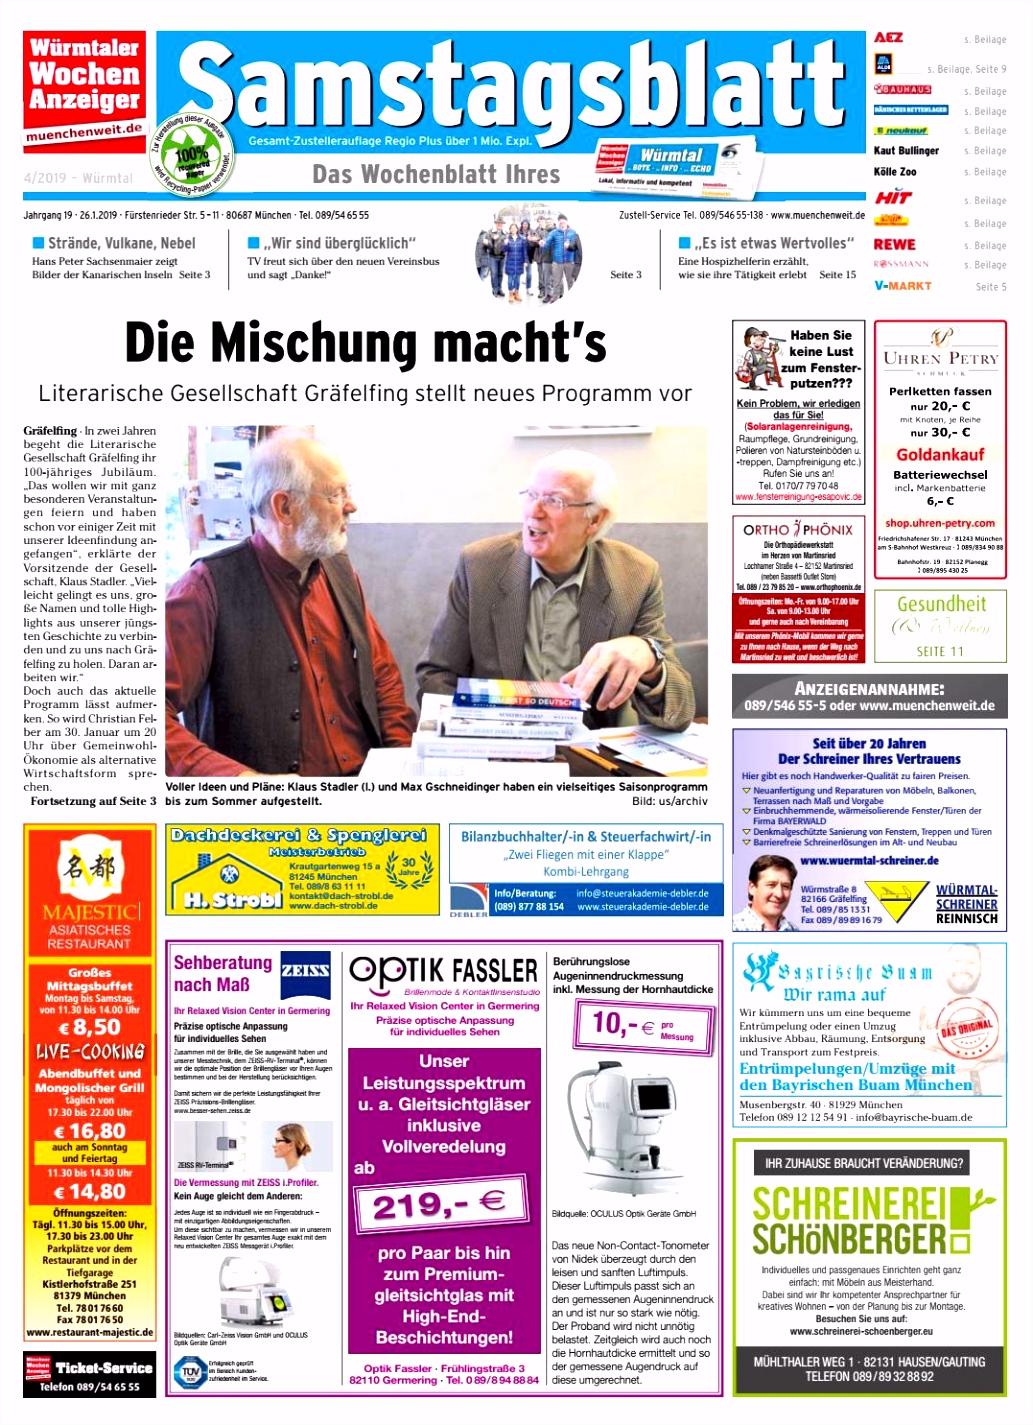 KW 04 2019 by Wochenanzeiger Me n GmbH issuu